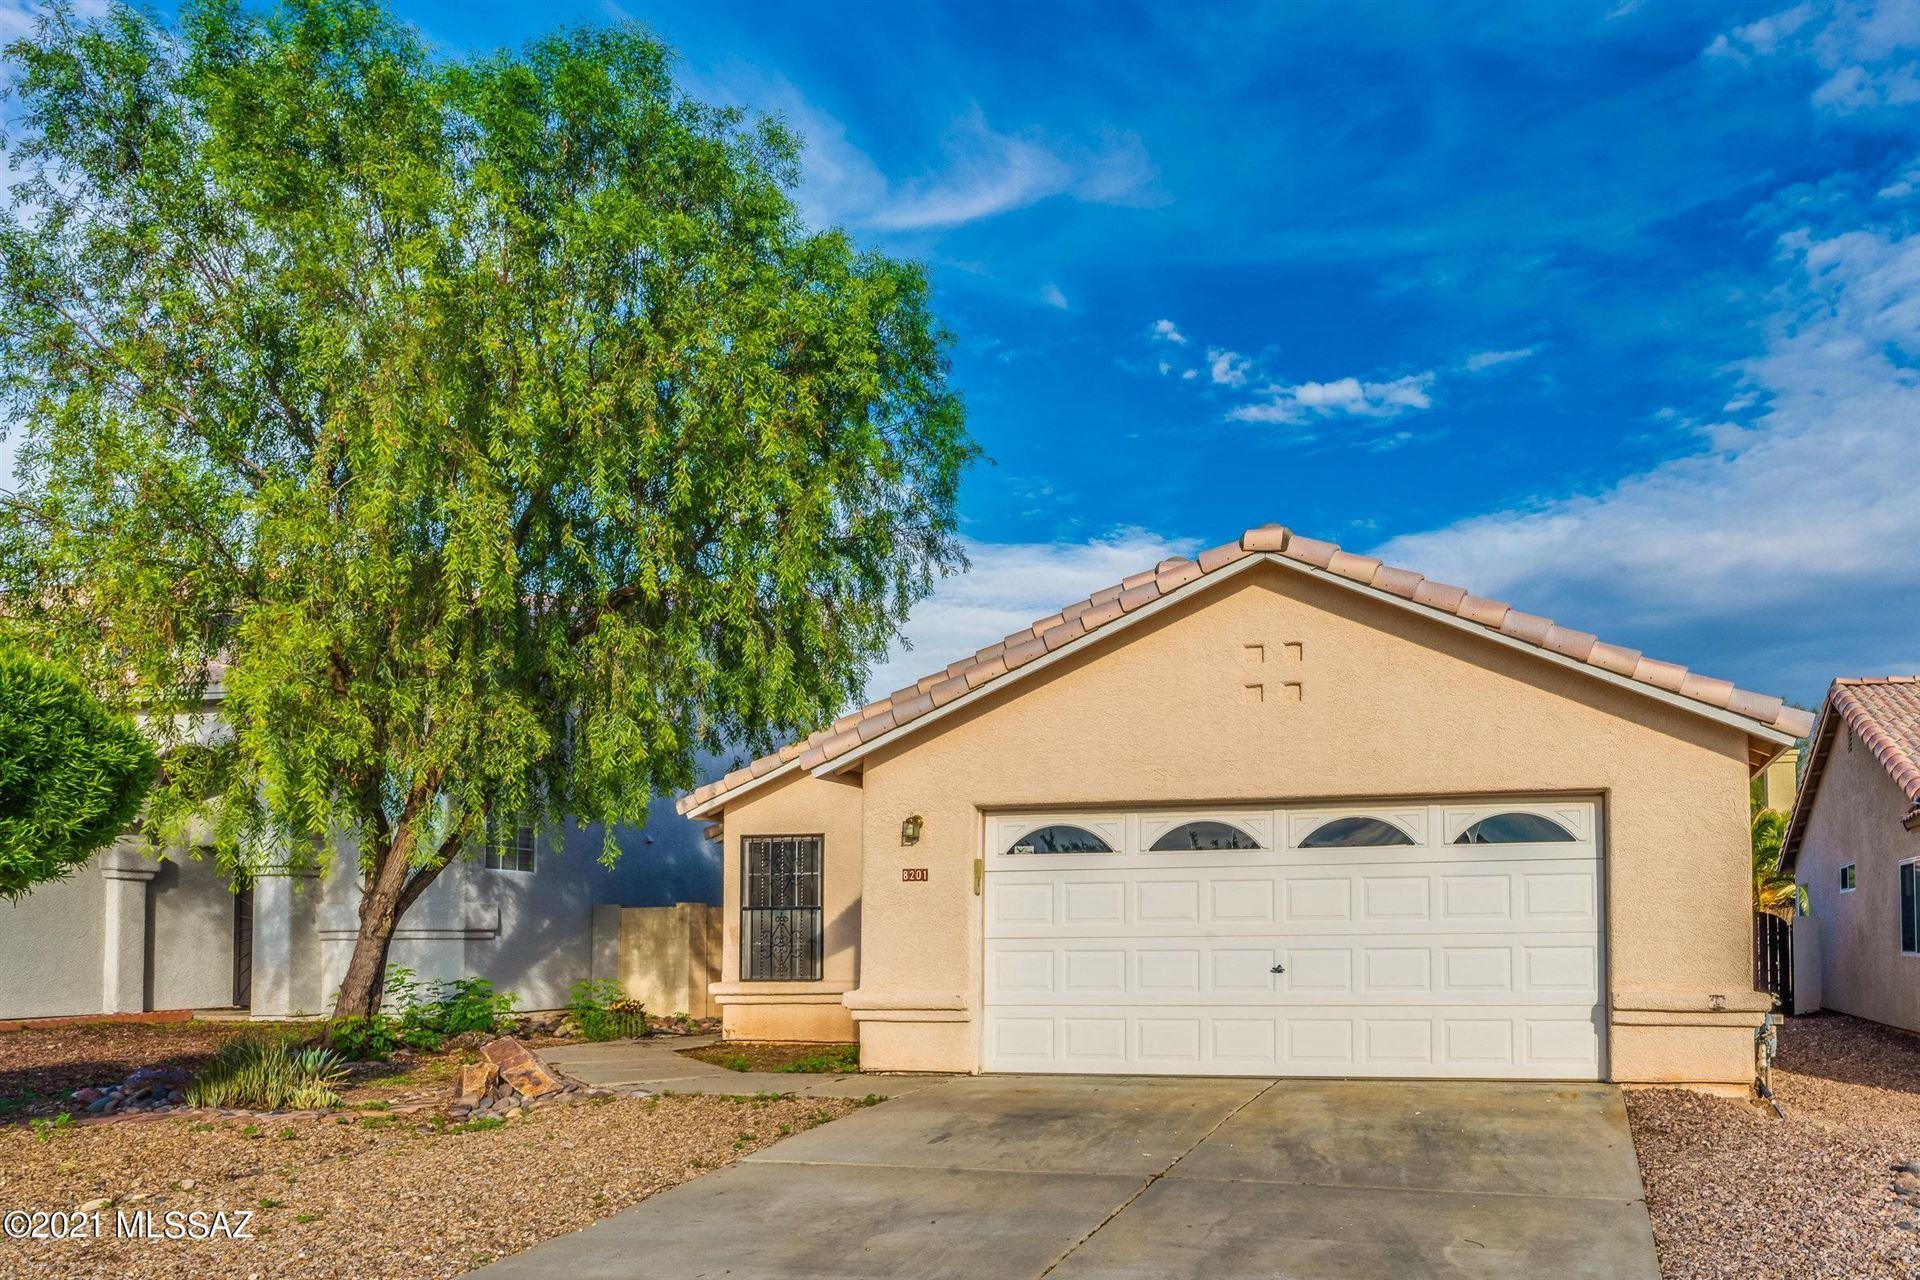 8201 S Via Elemental, Tucson, AZ 85747 - MLS#: 22119157